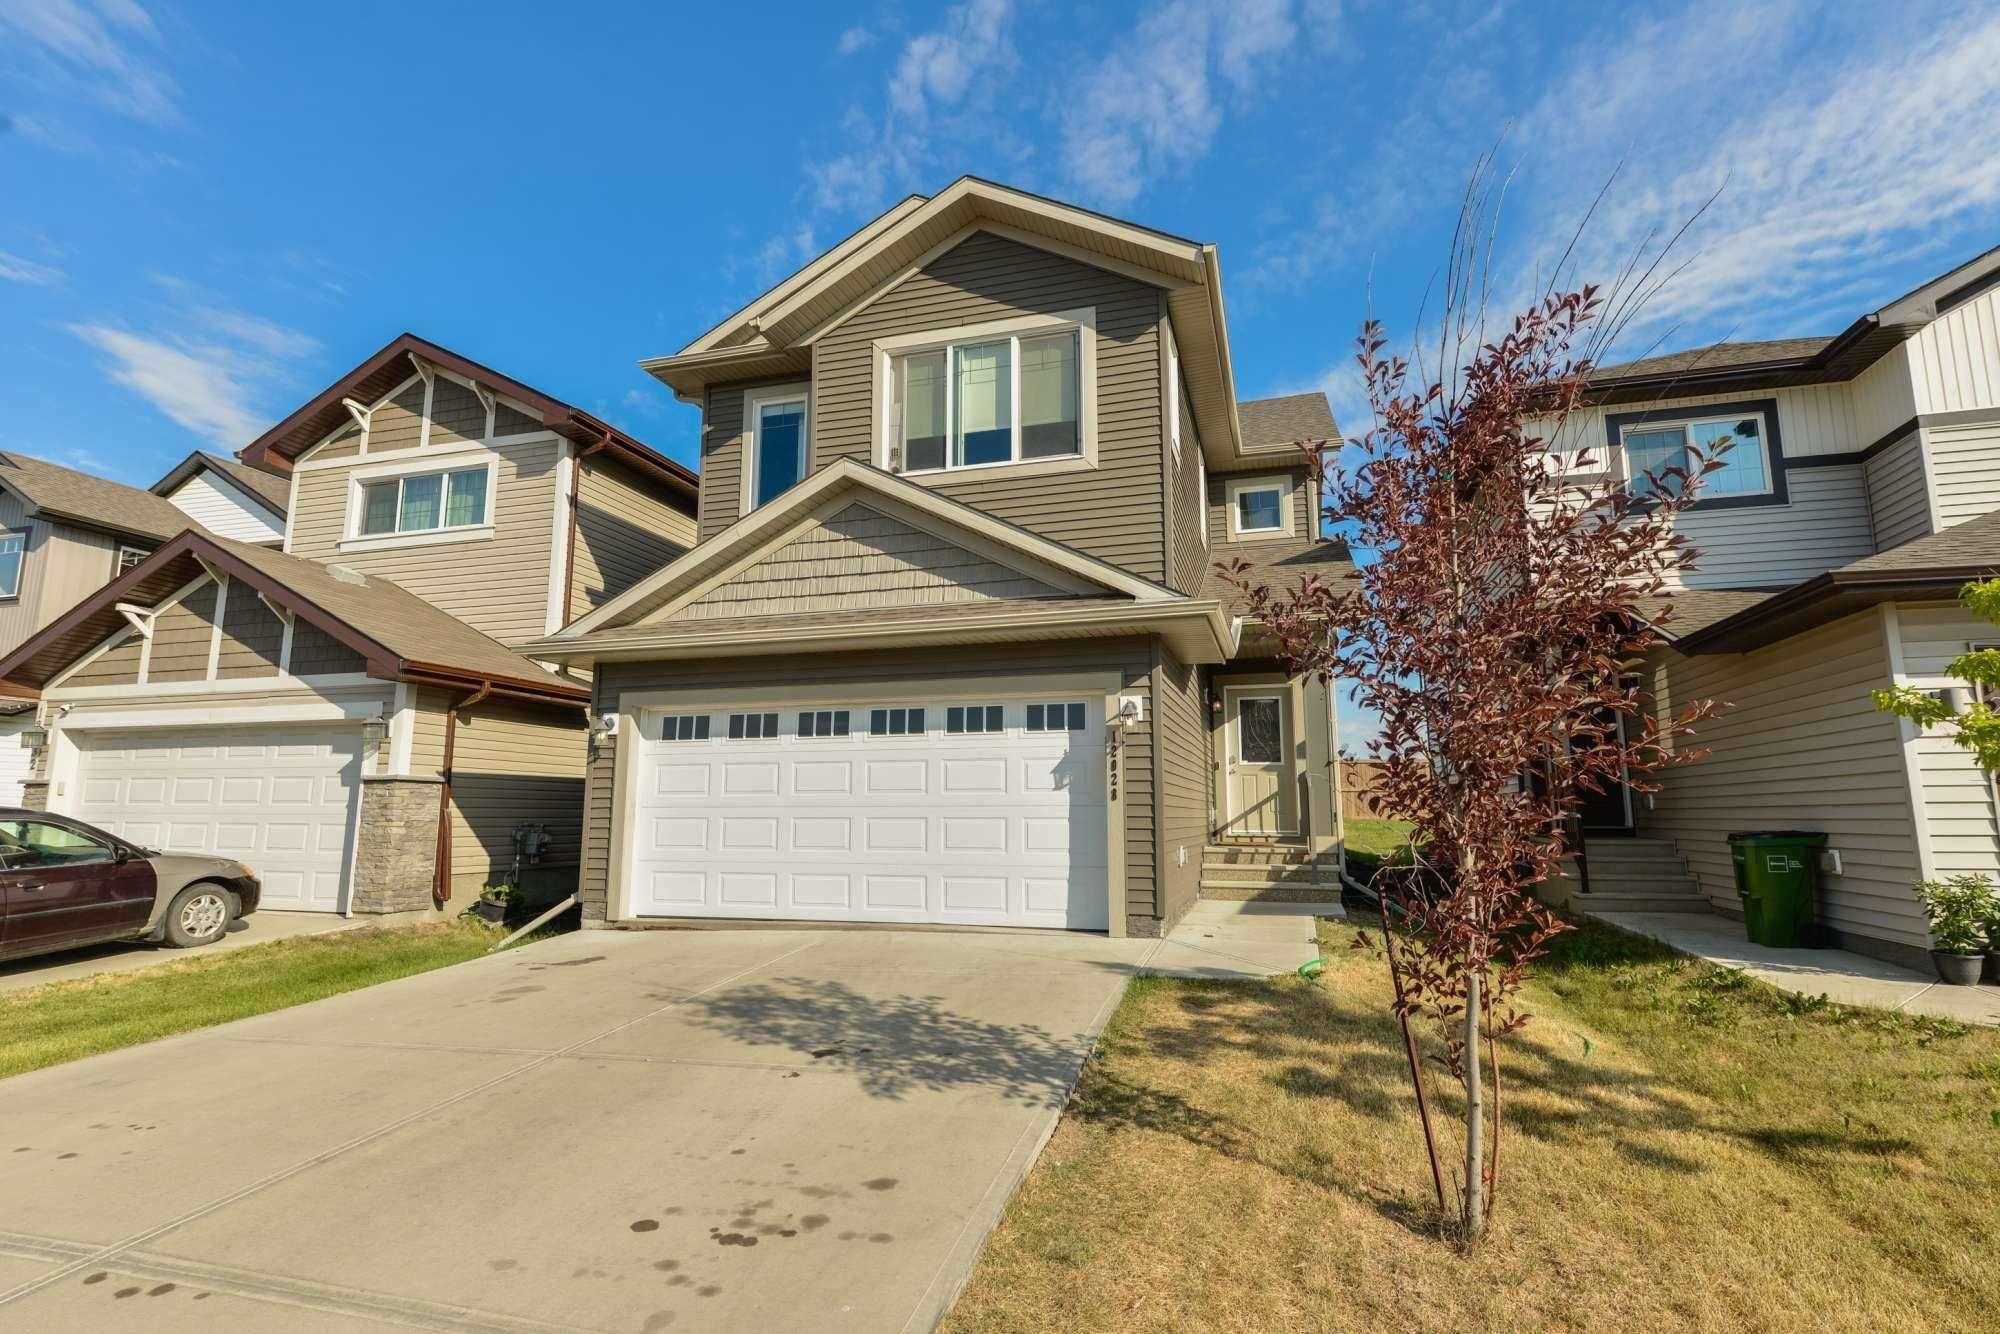 Main Photo: 12028 177 Avenue in Edmonton: Zone 27 House for sale : MLS®# E4254246